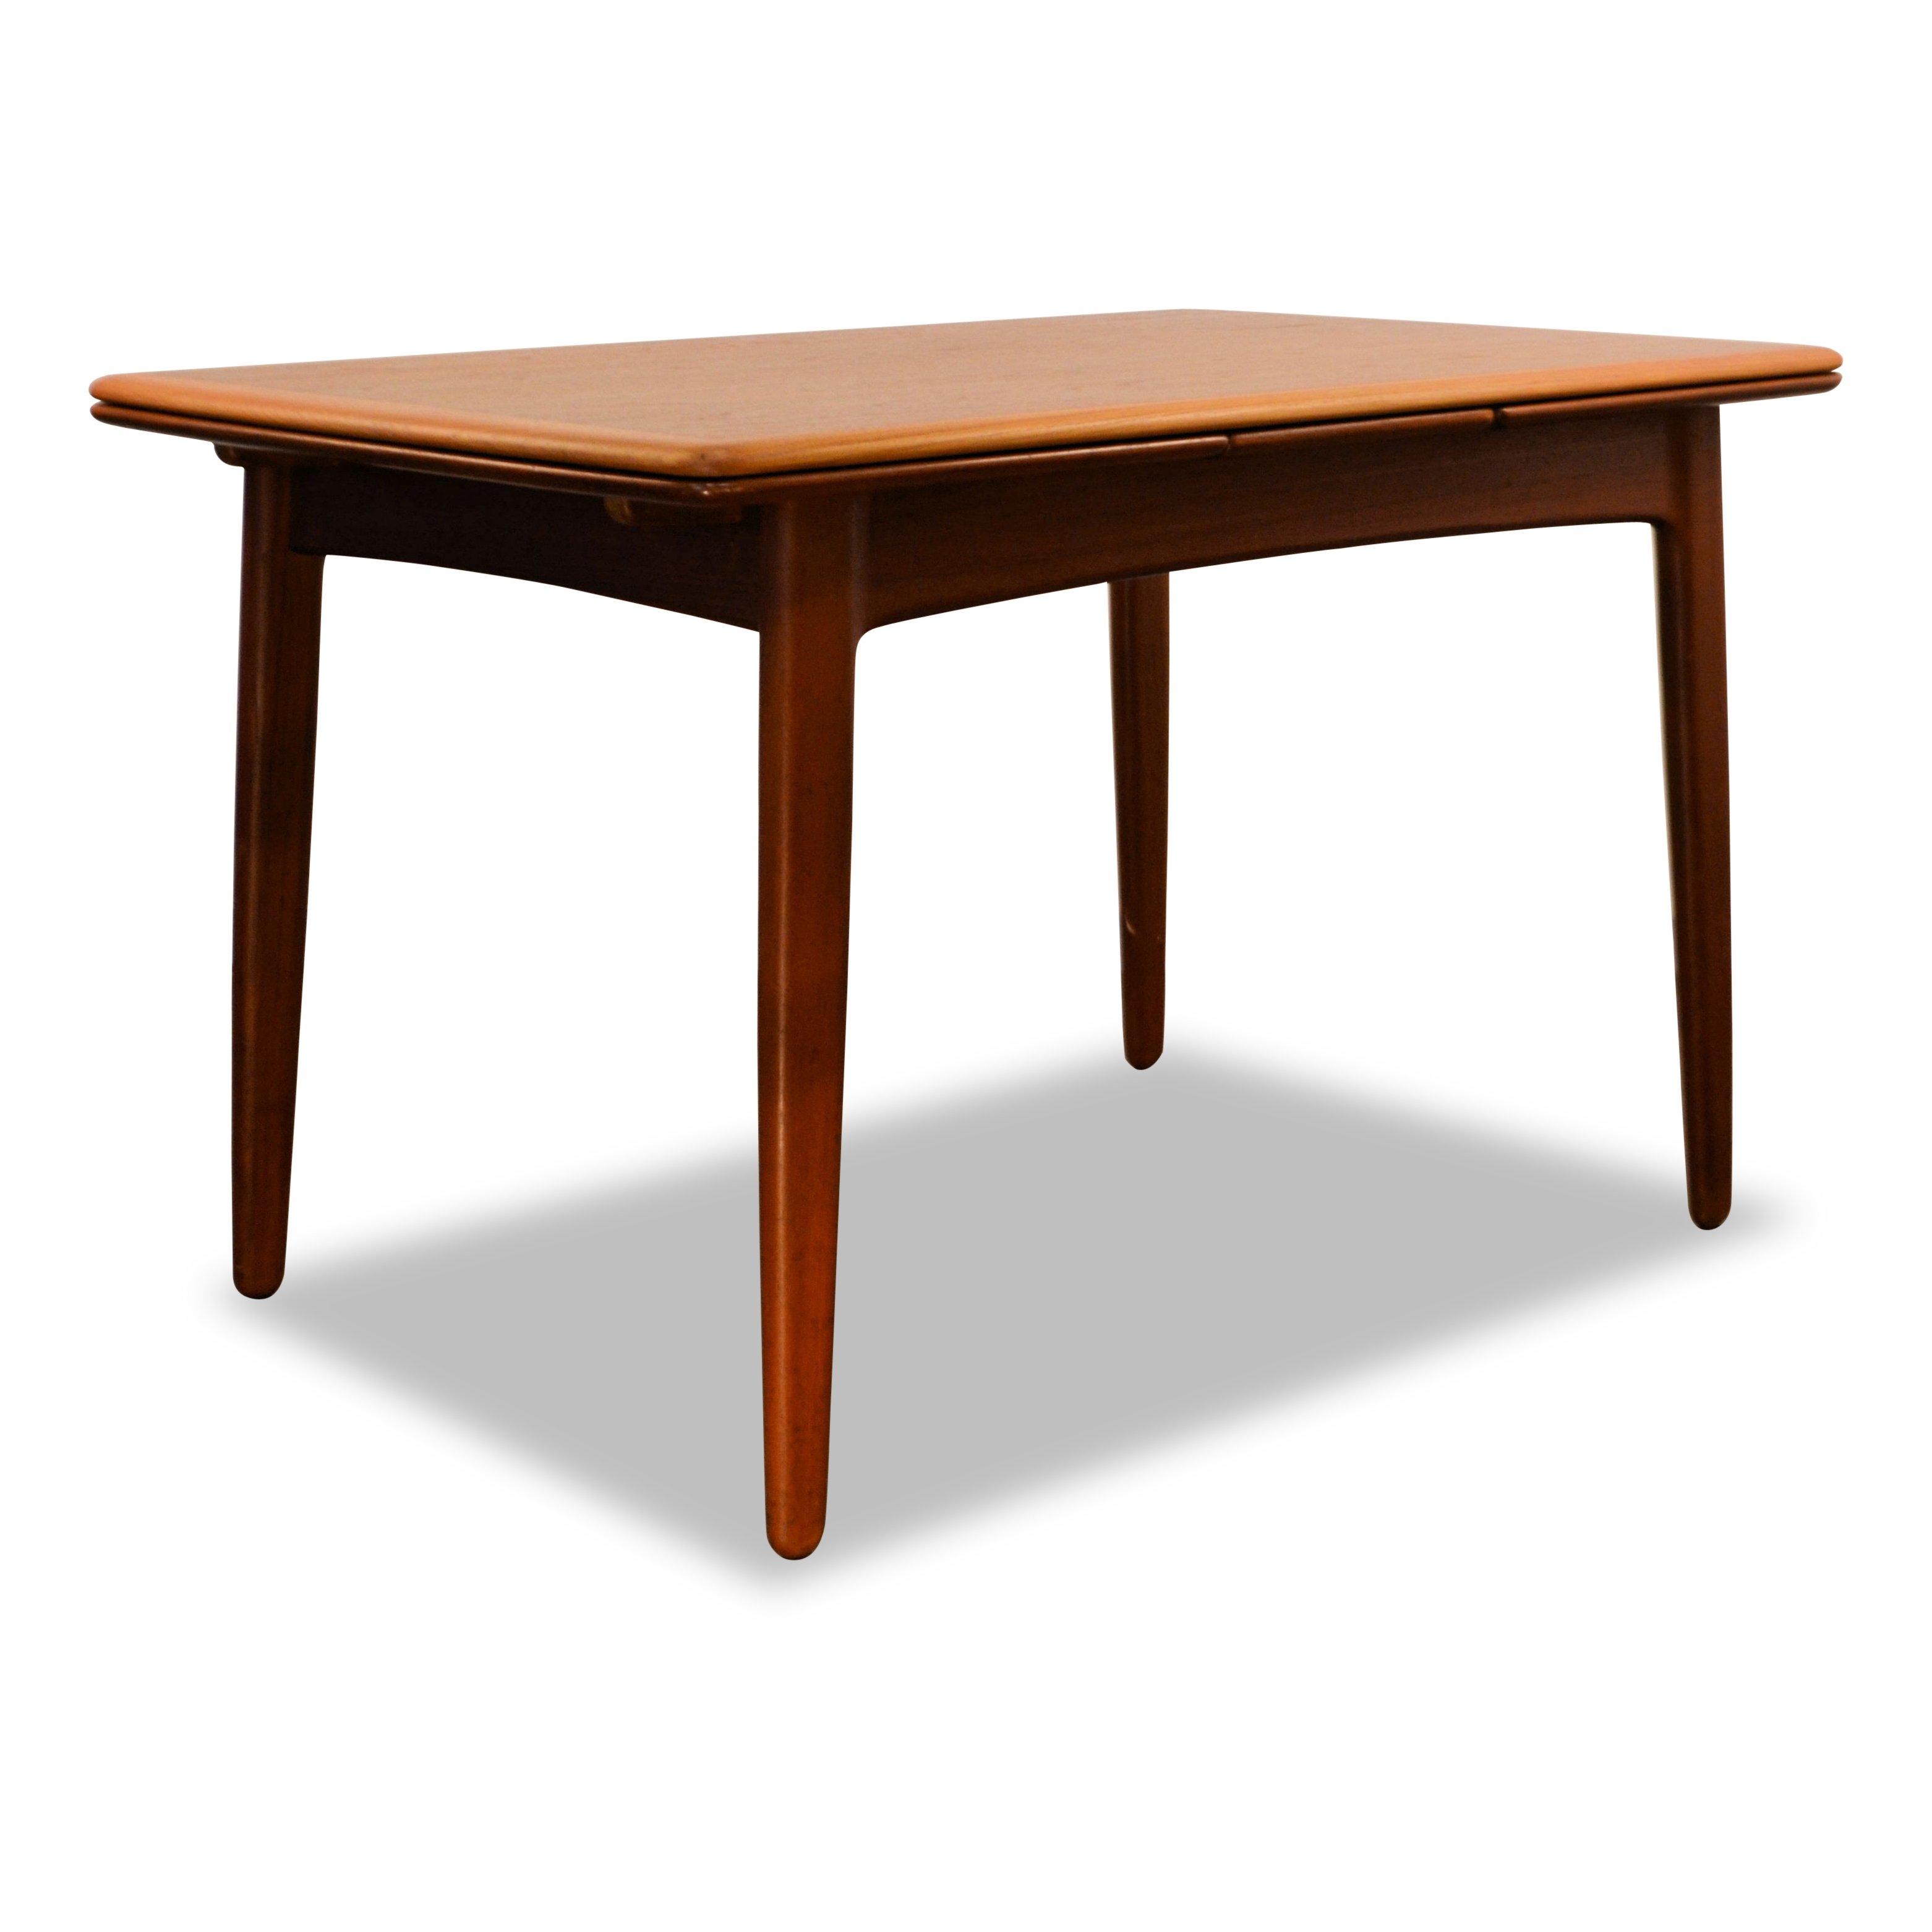 Vintage Svend Aage Madsen Teak Extendable Dining Table Small Version 117638